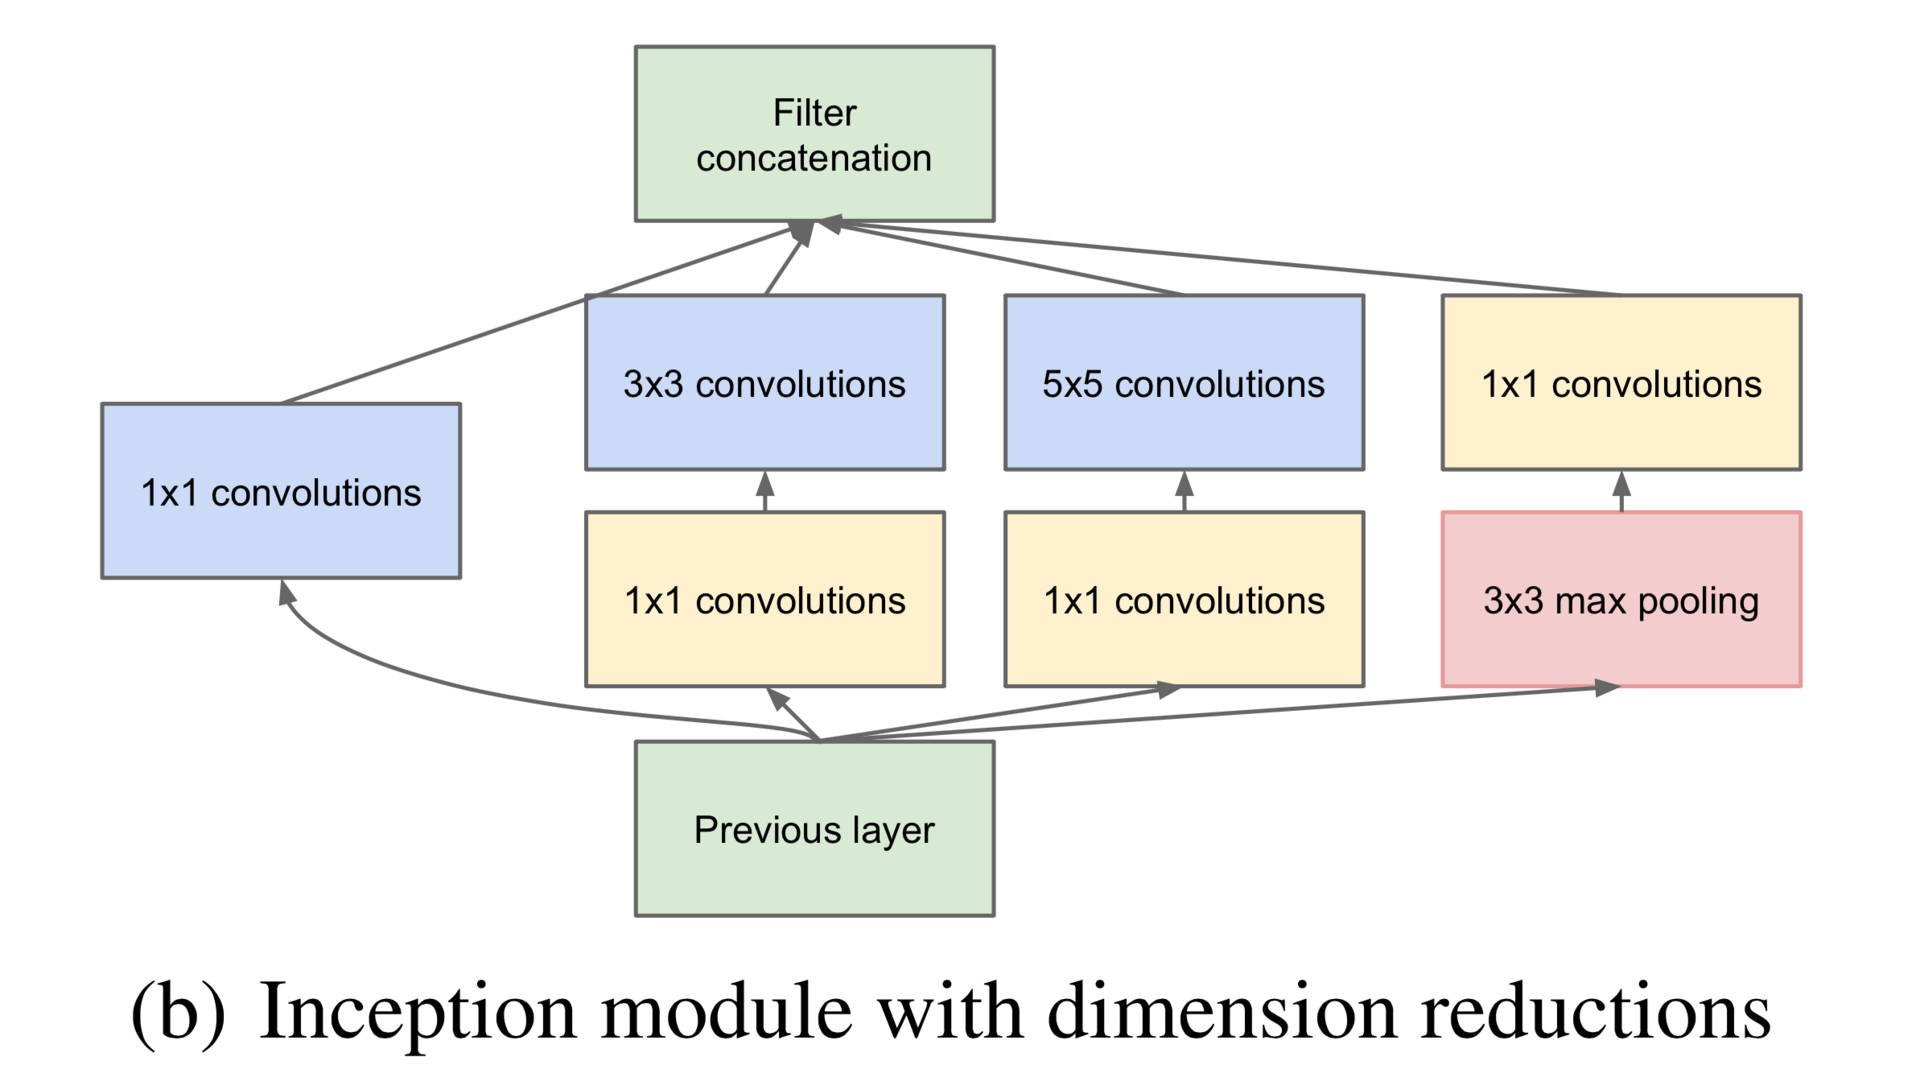 Inception module